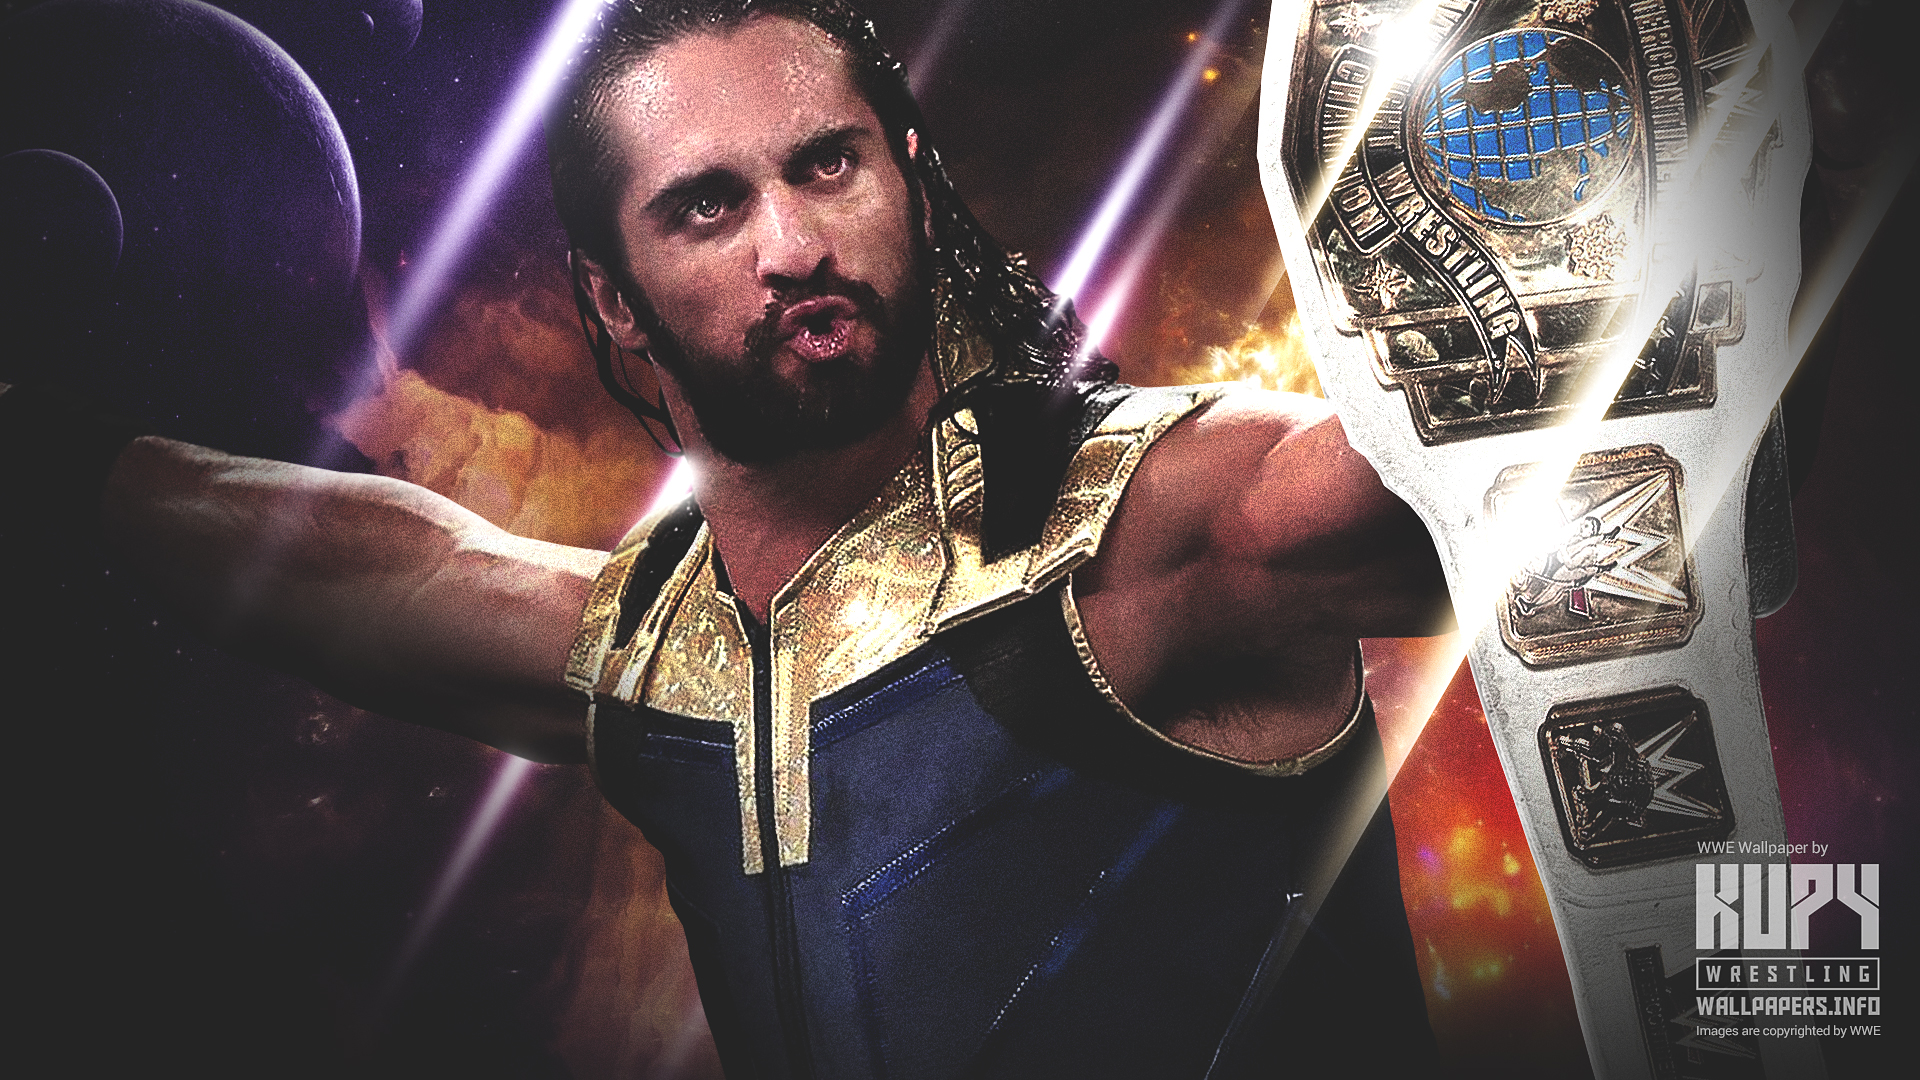 Wwe Summerslam 2018 Aftermath New Intercontinental Champion Seth